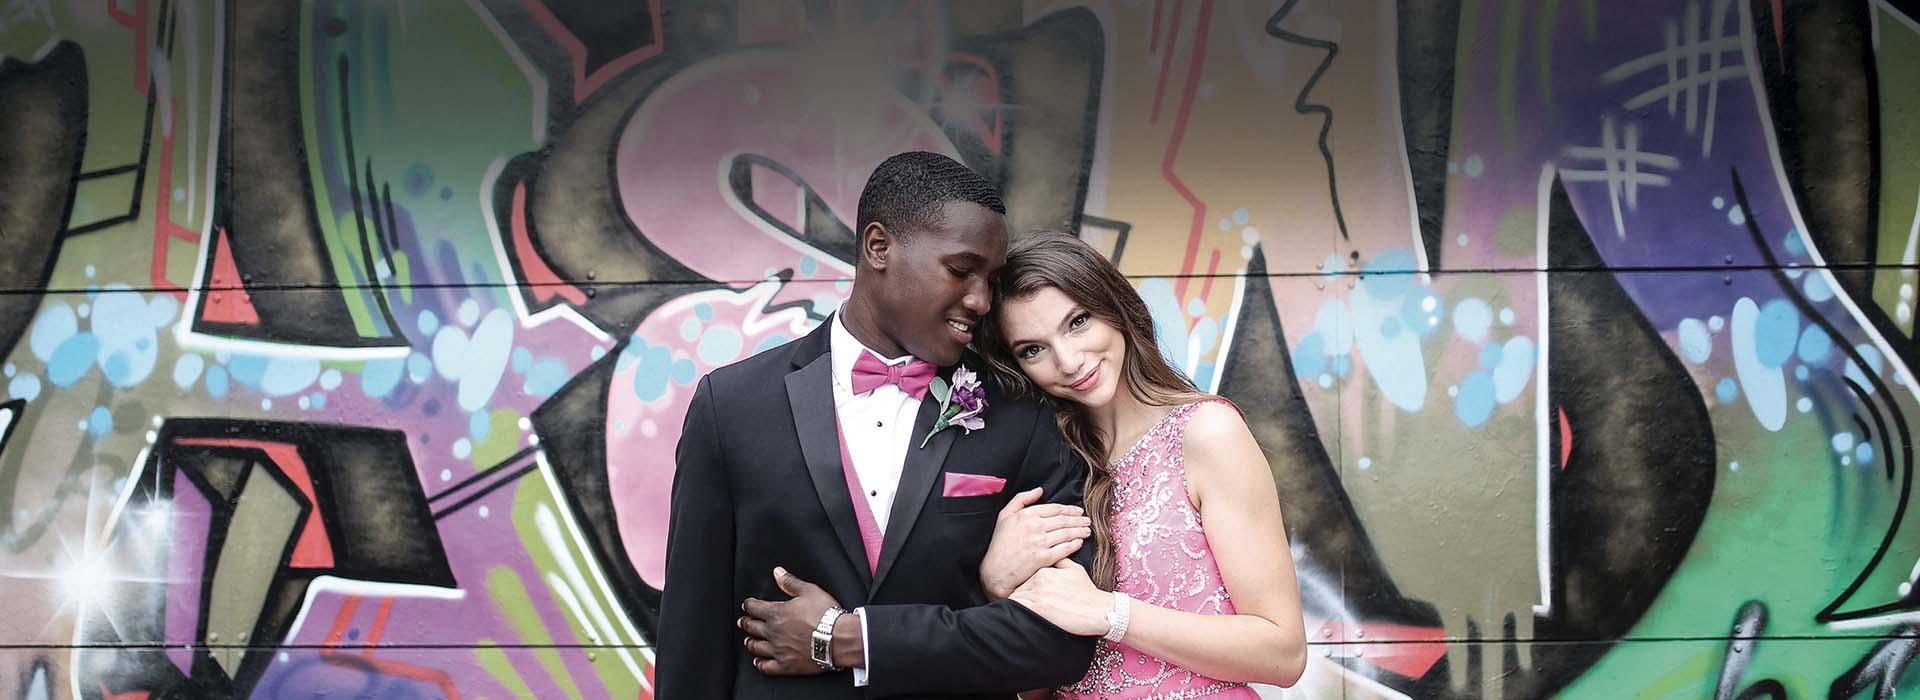 Prom Image 2